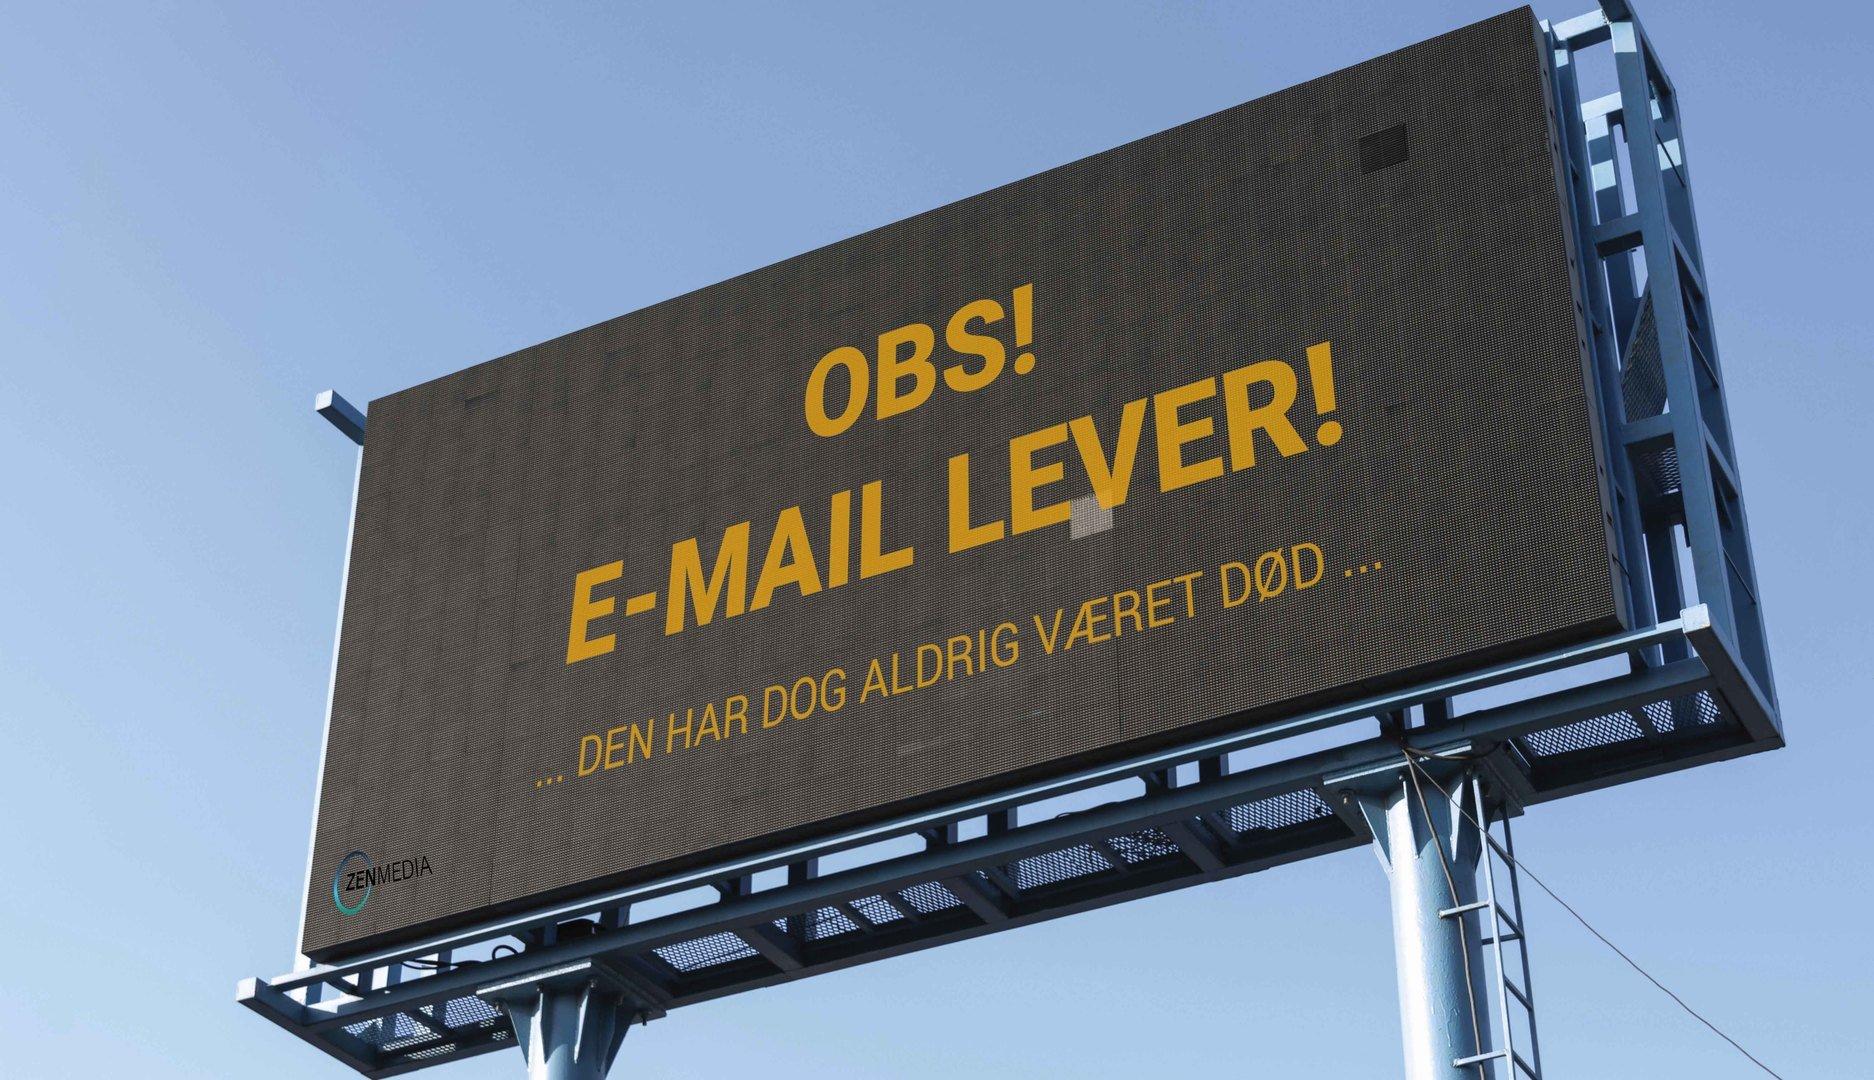 Email marketing, b2b lead, sales, b2b leadgenerering